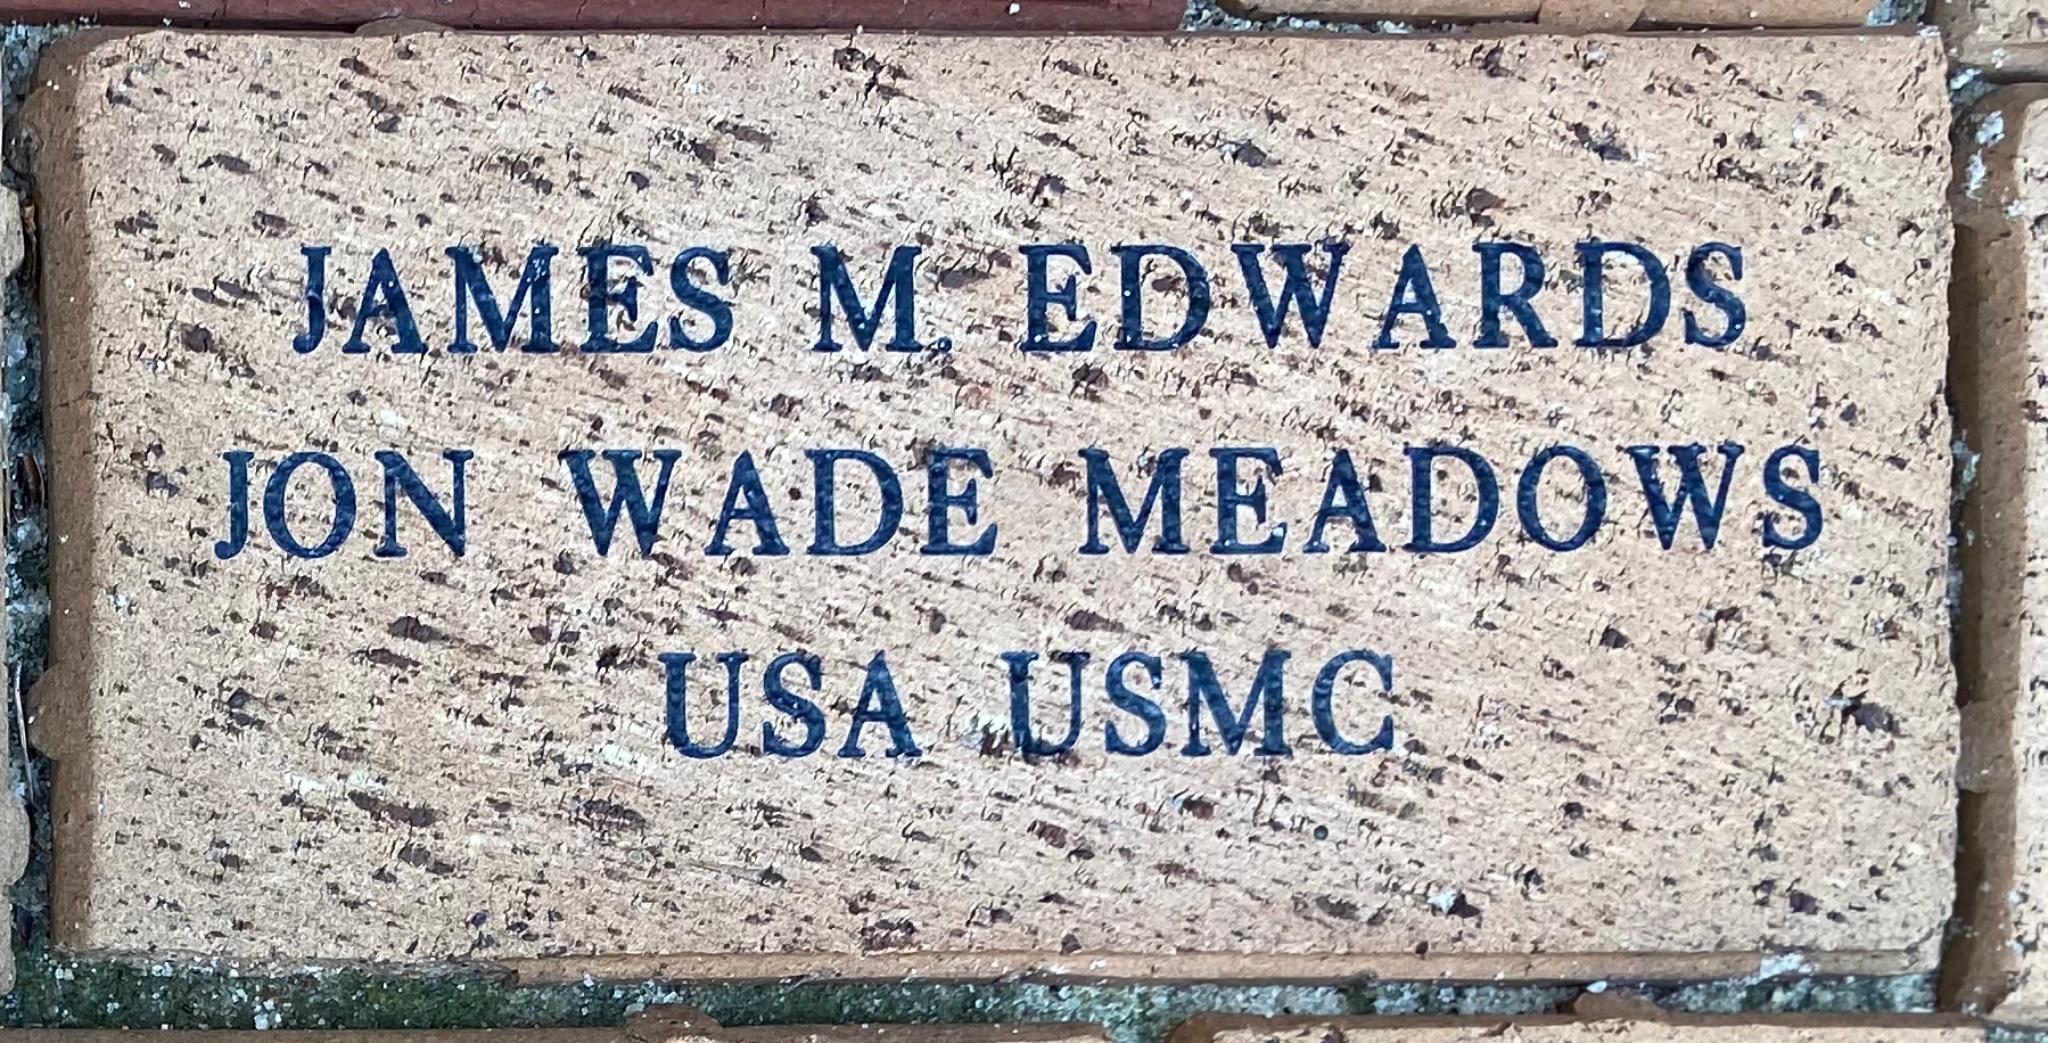 JAMES M EDWARDS JON WADE MEADOWS USA USMC